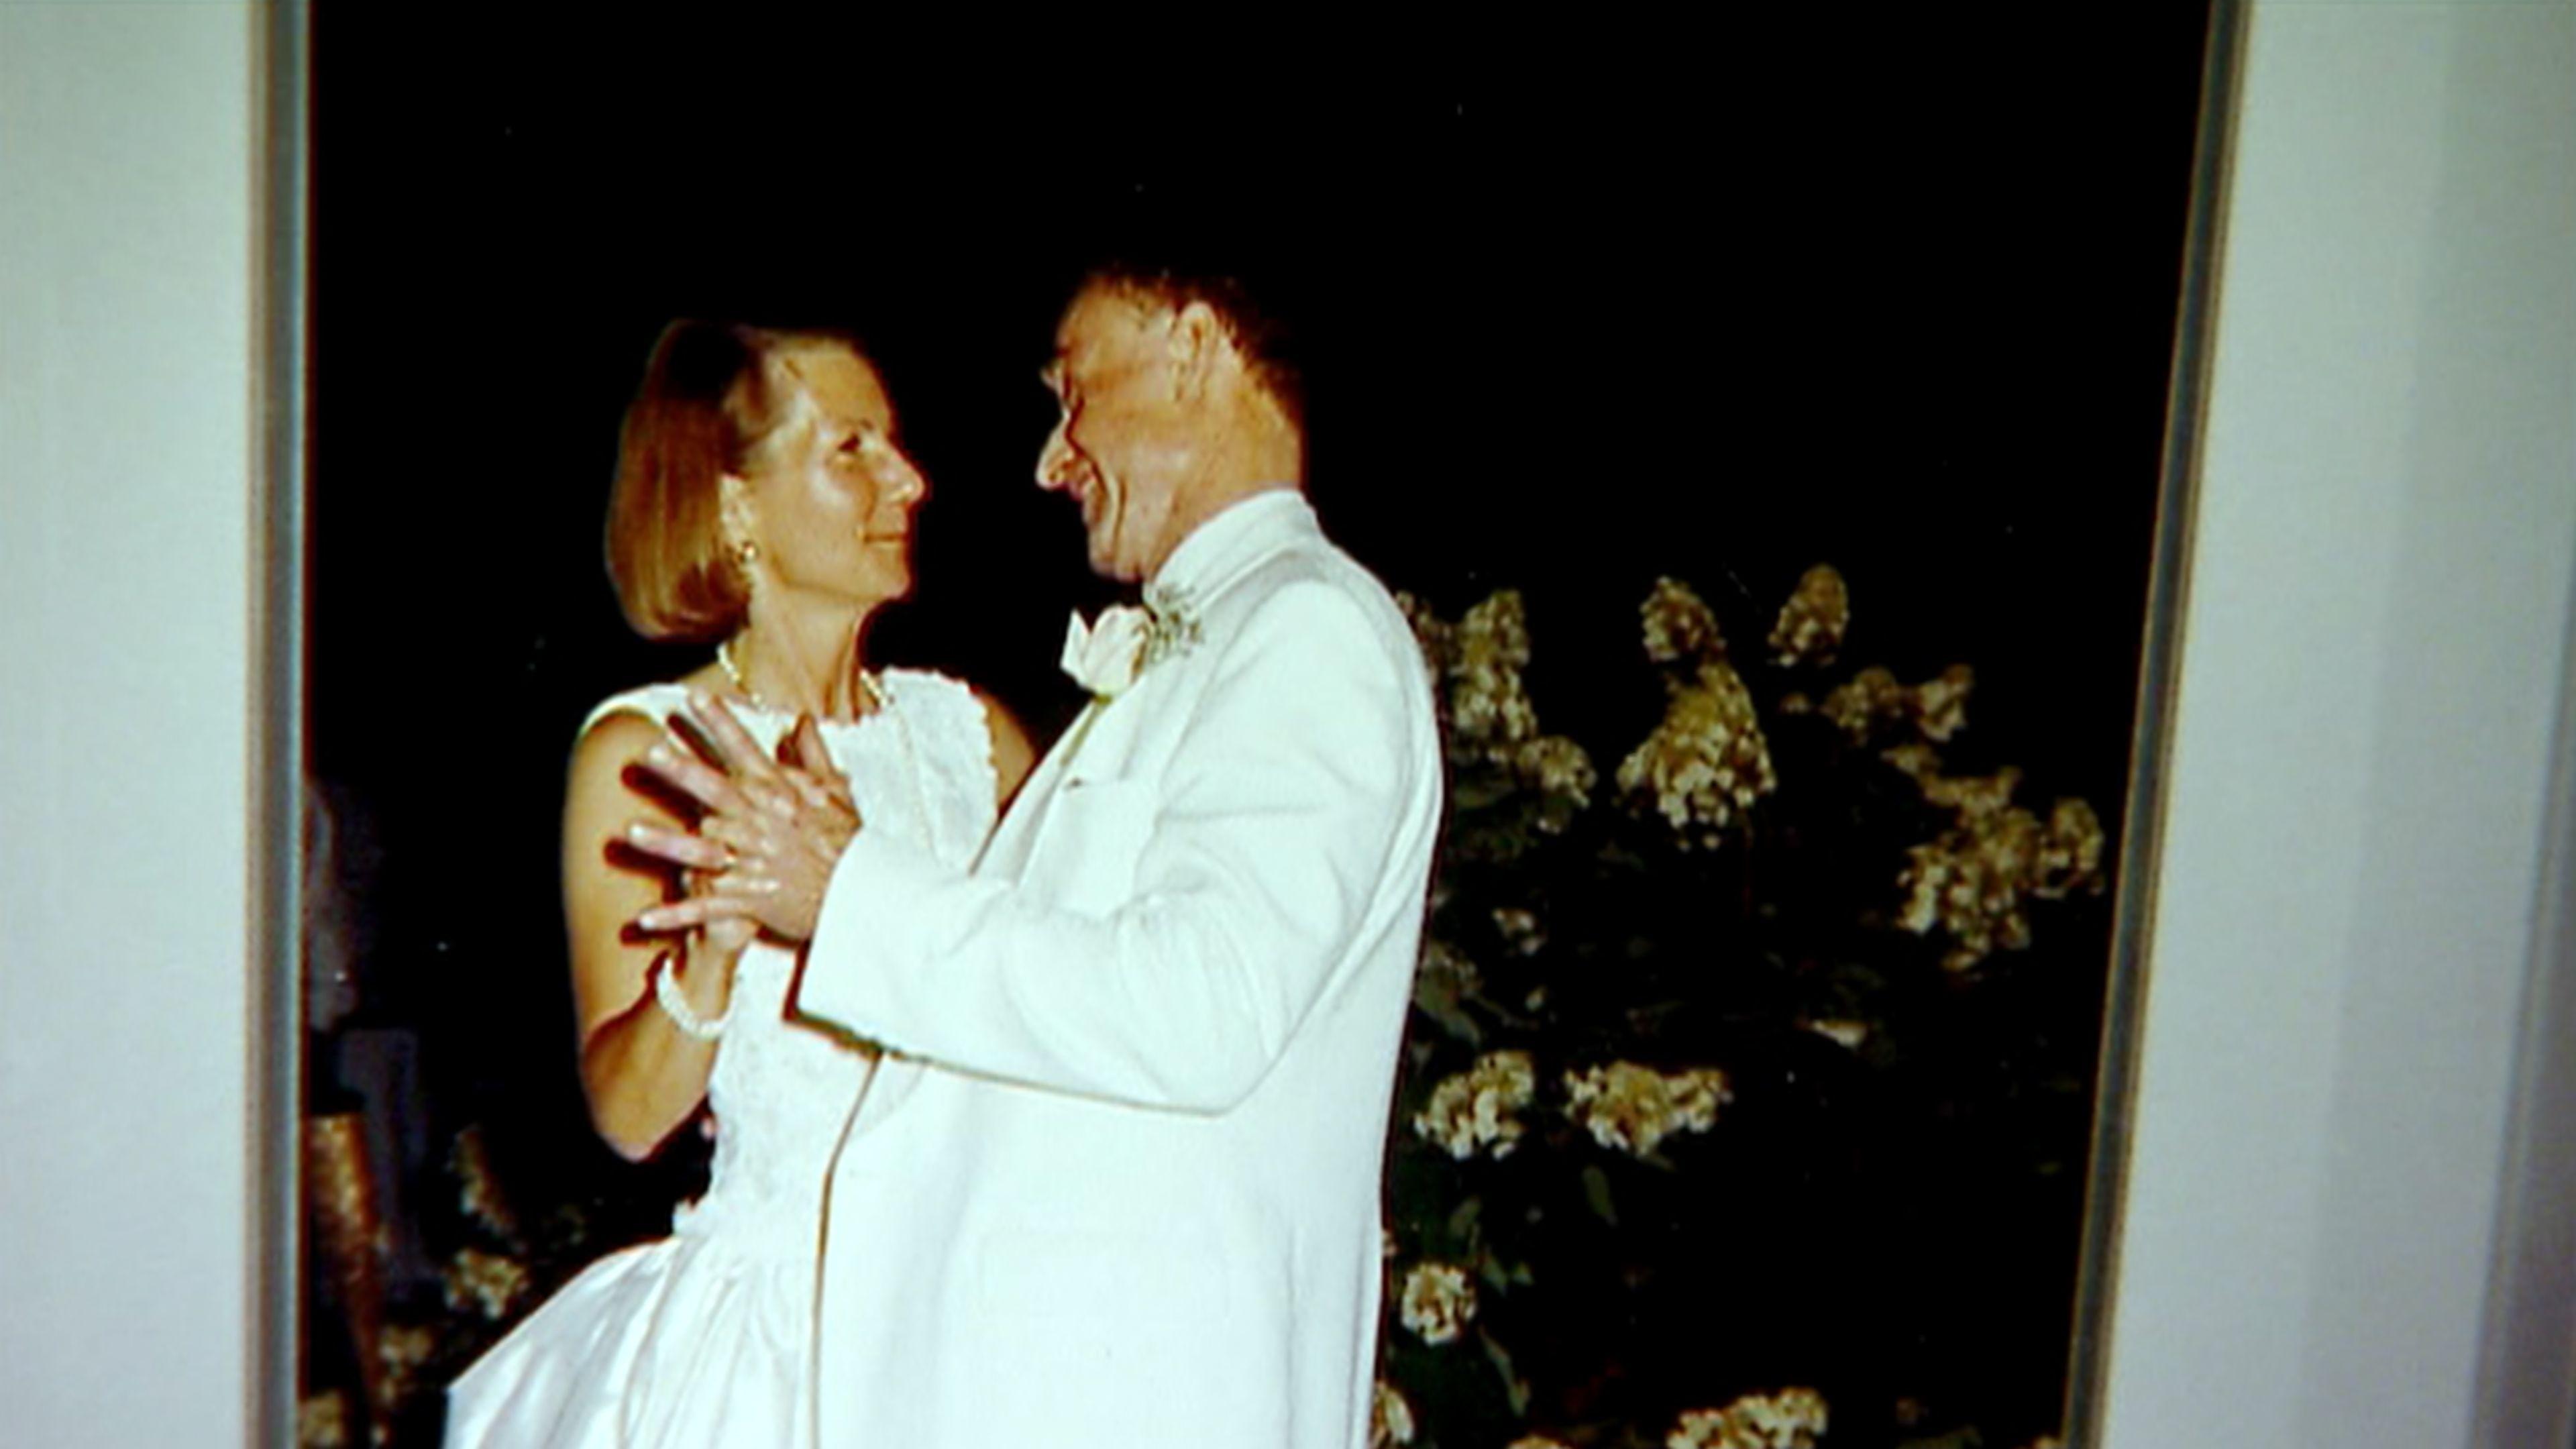 Did Michael Peterson kill Kathleen Peterson? 9 interesting